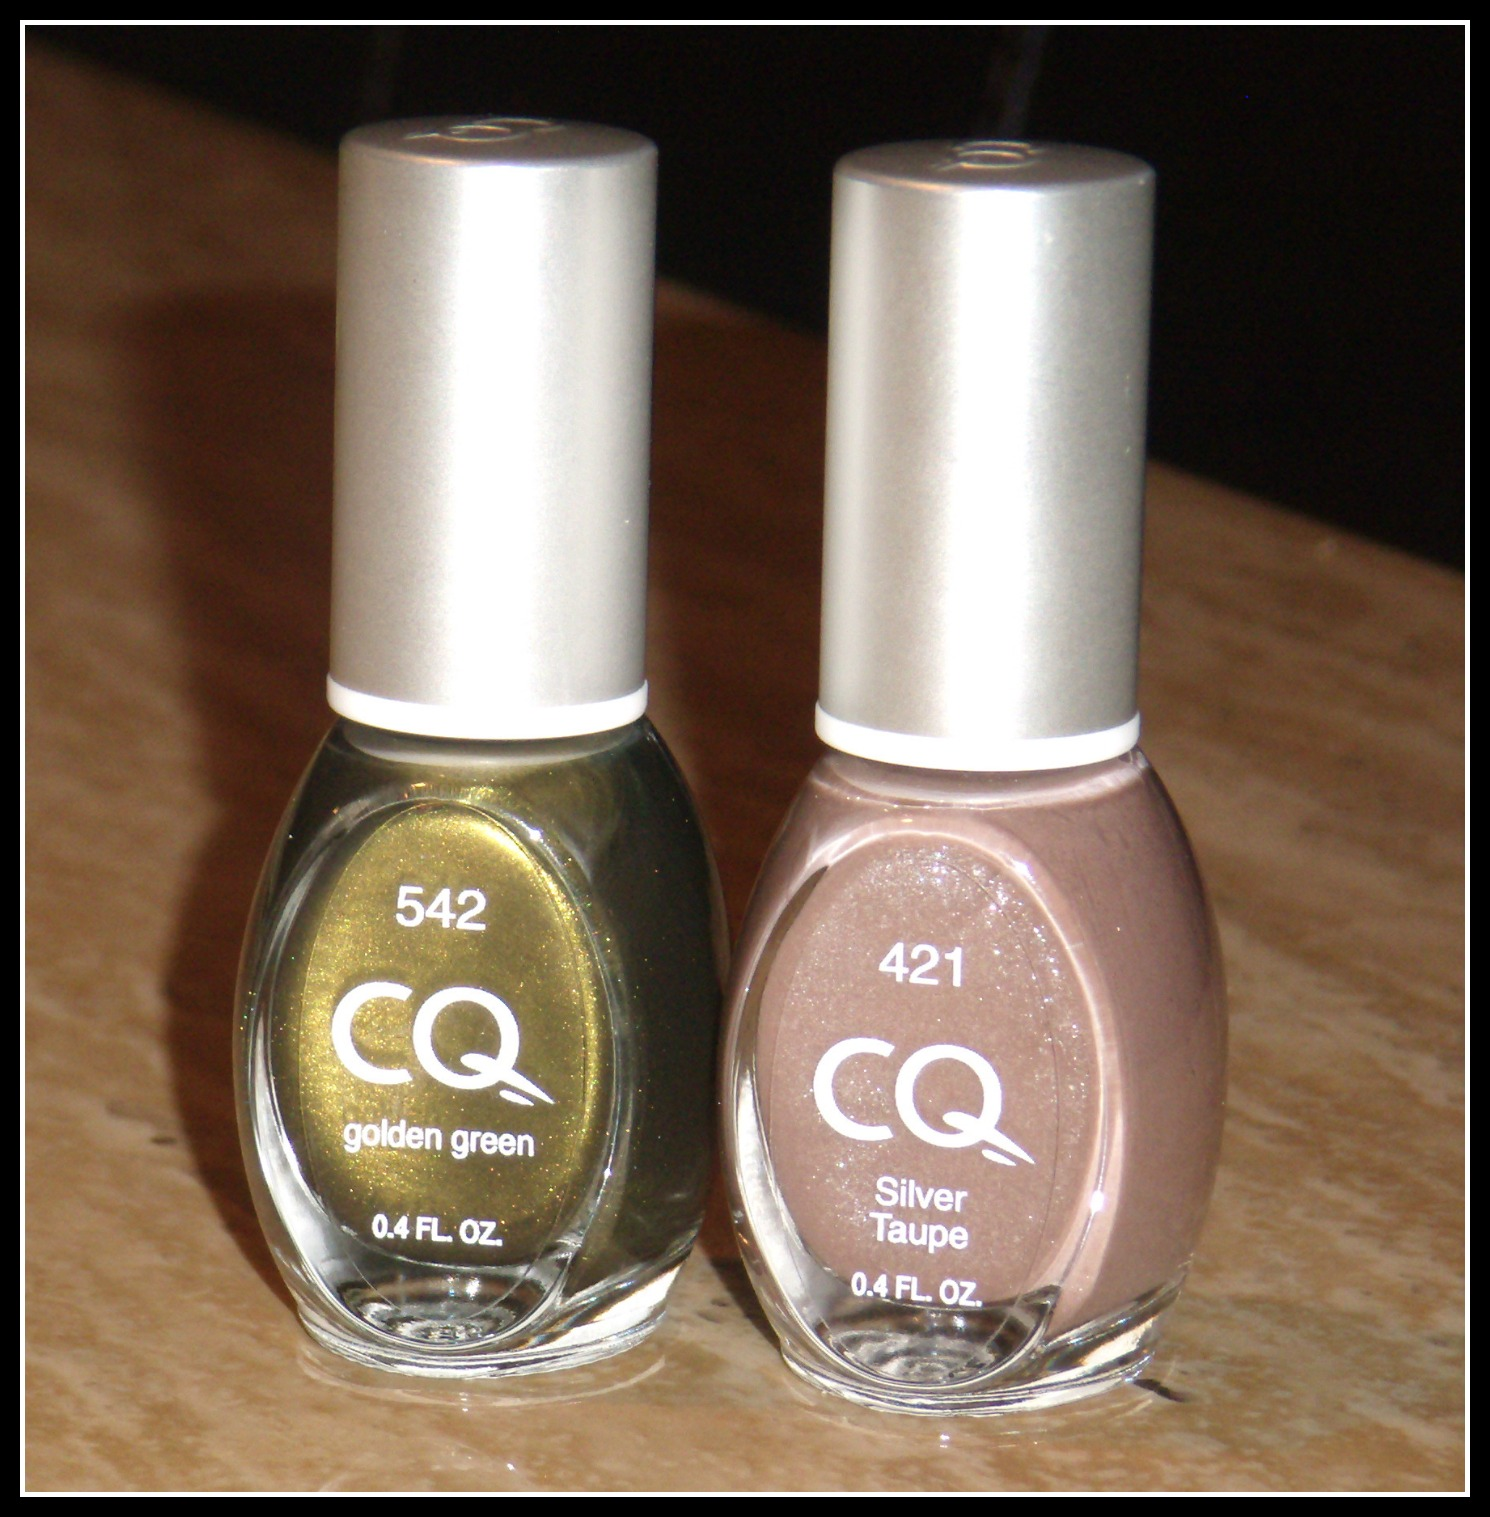 Cq Nails   NailsTip